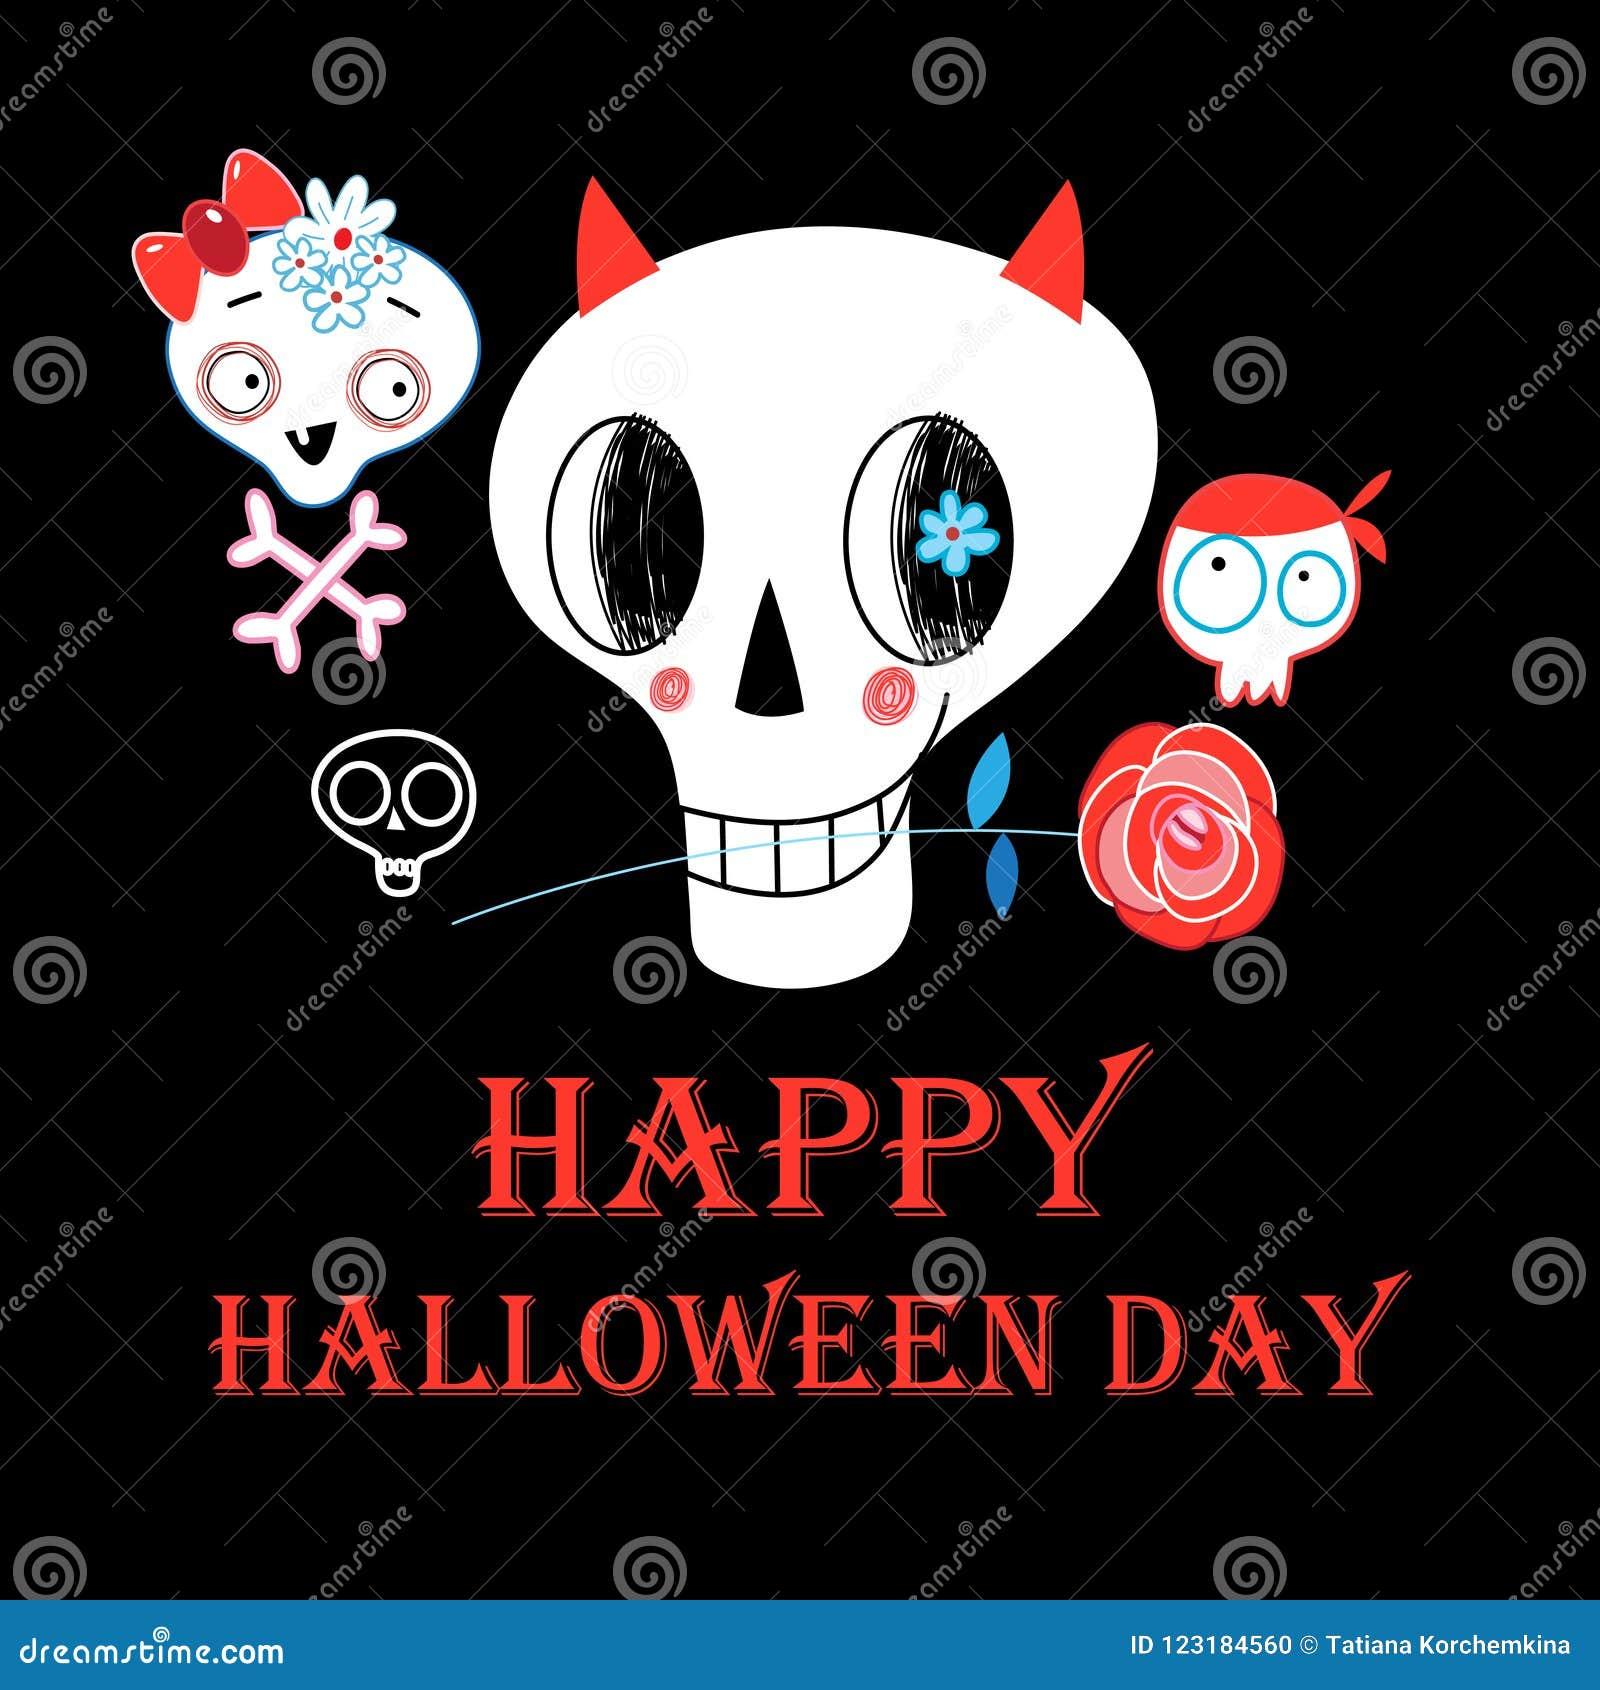 Festive Greeting Card For Halloween Stock Vector Illustration Of